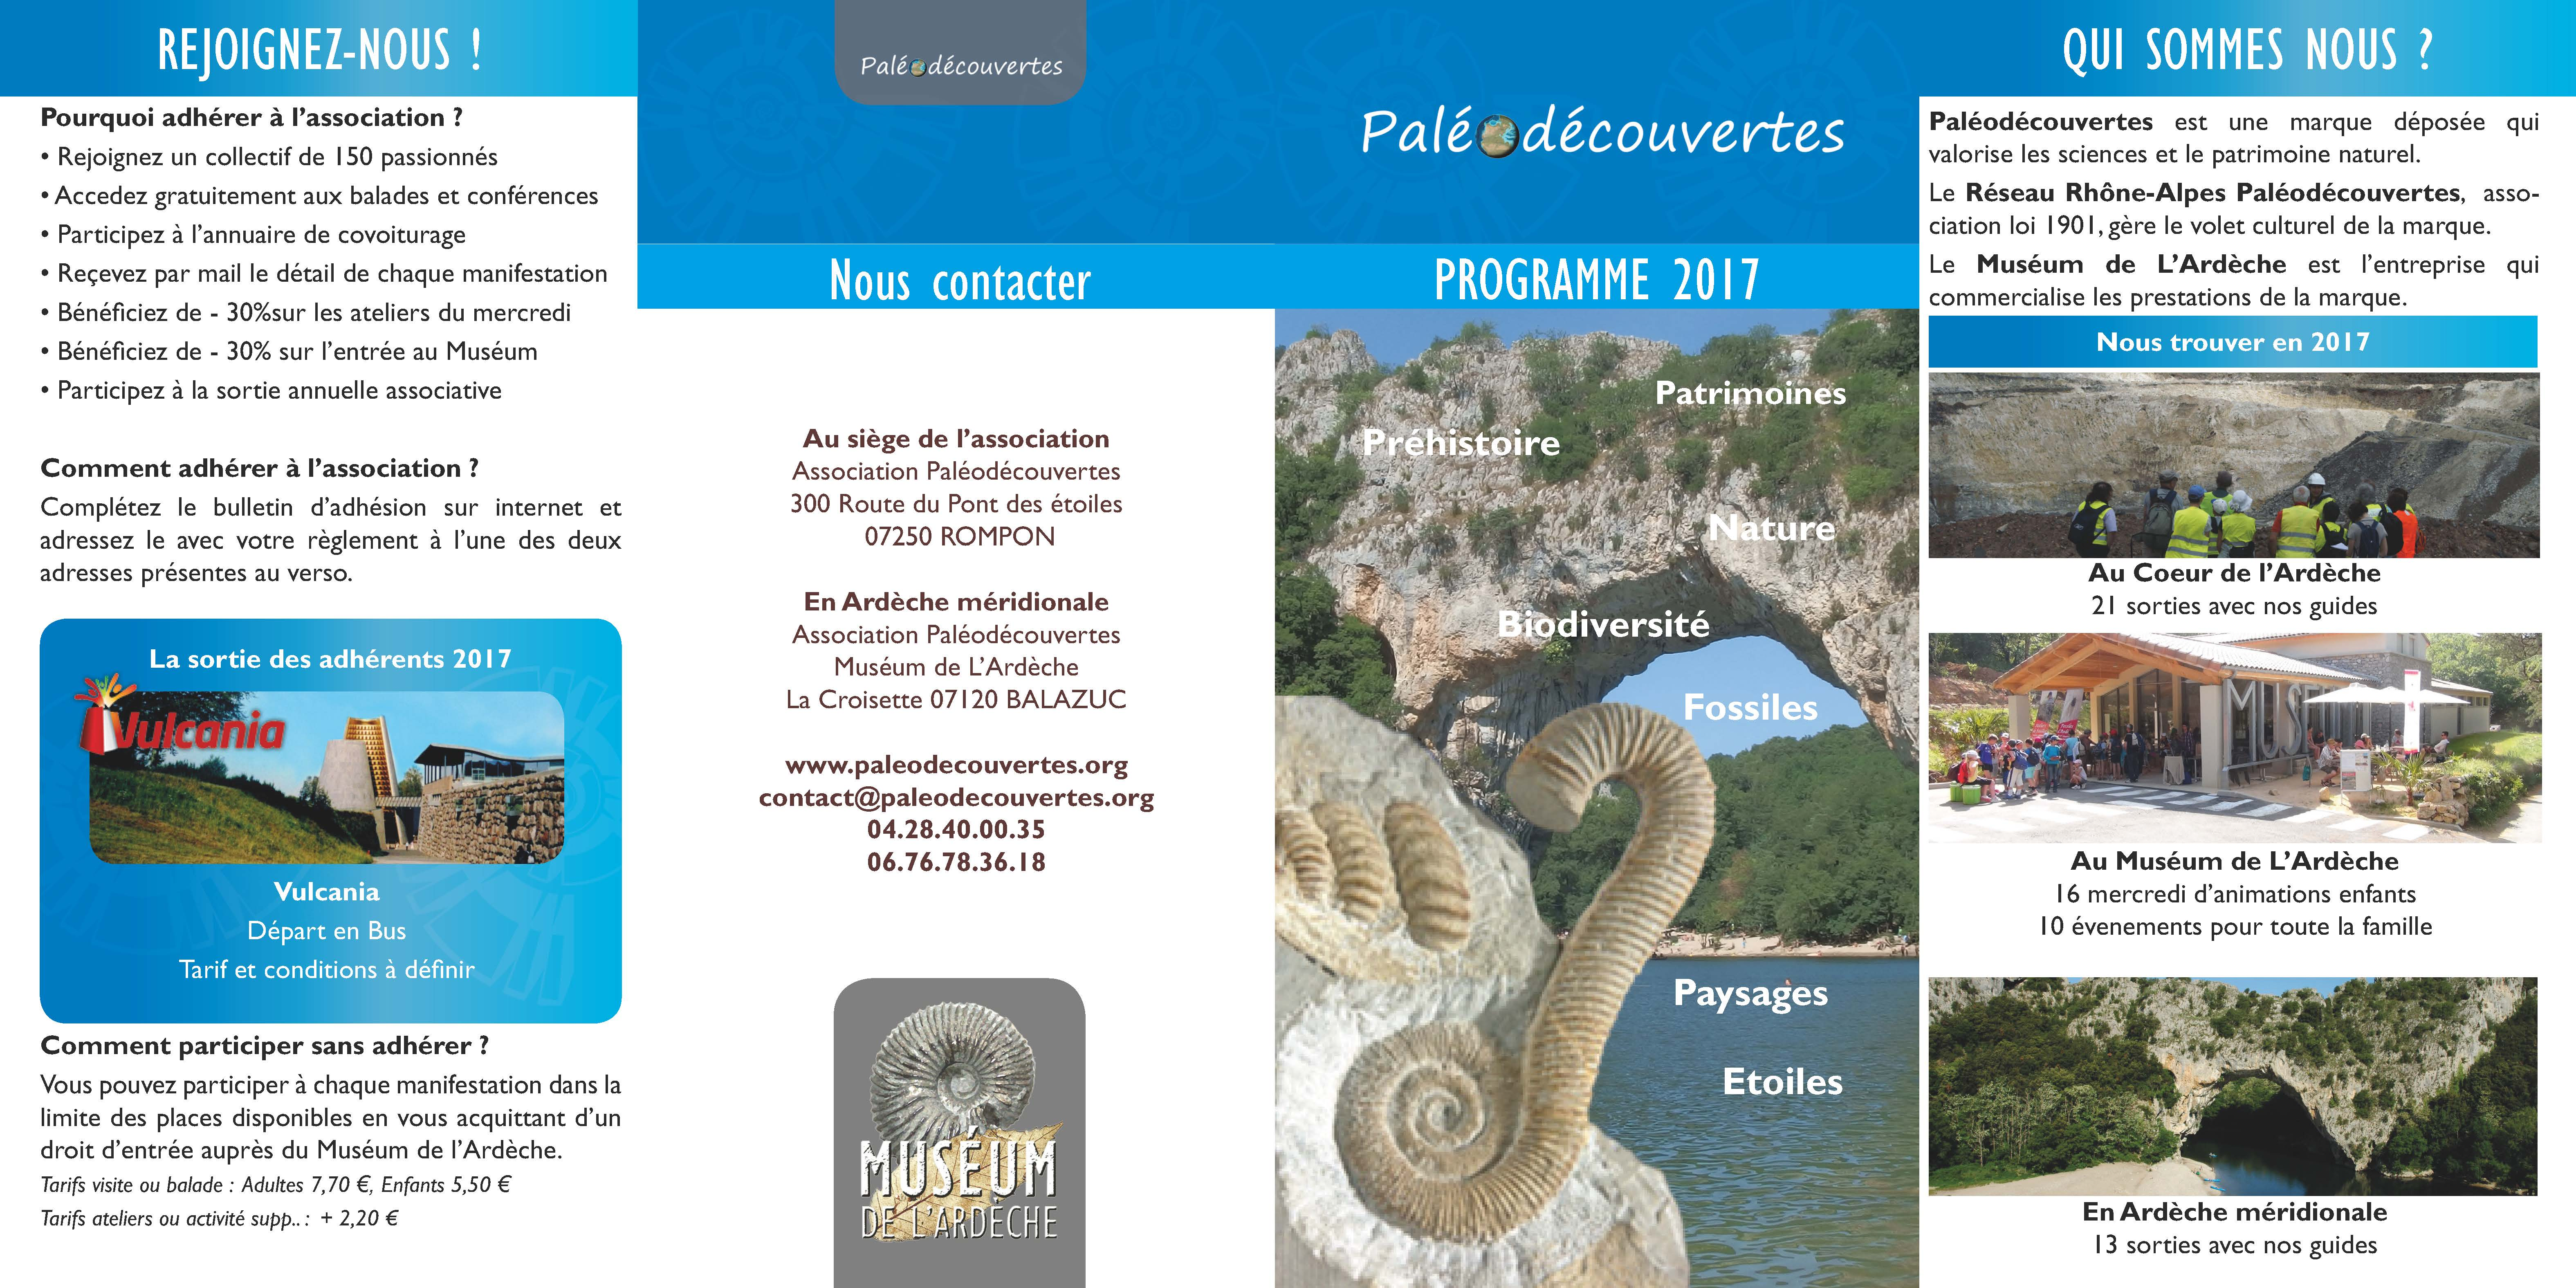 paleodecouvertes-programme2017_Page_1